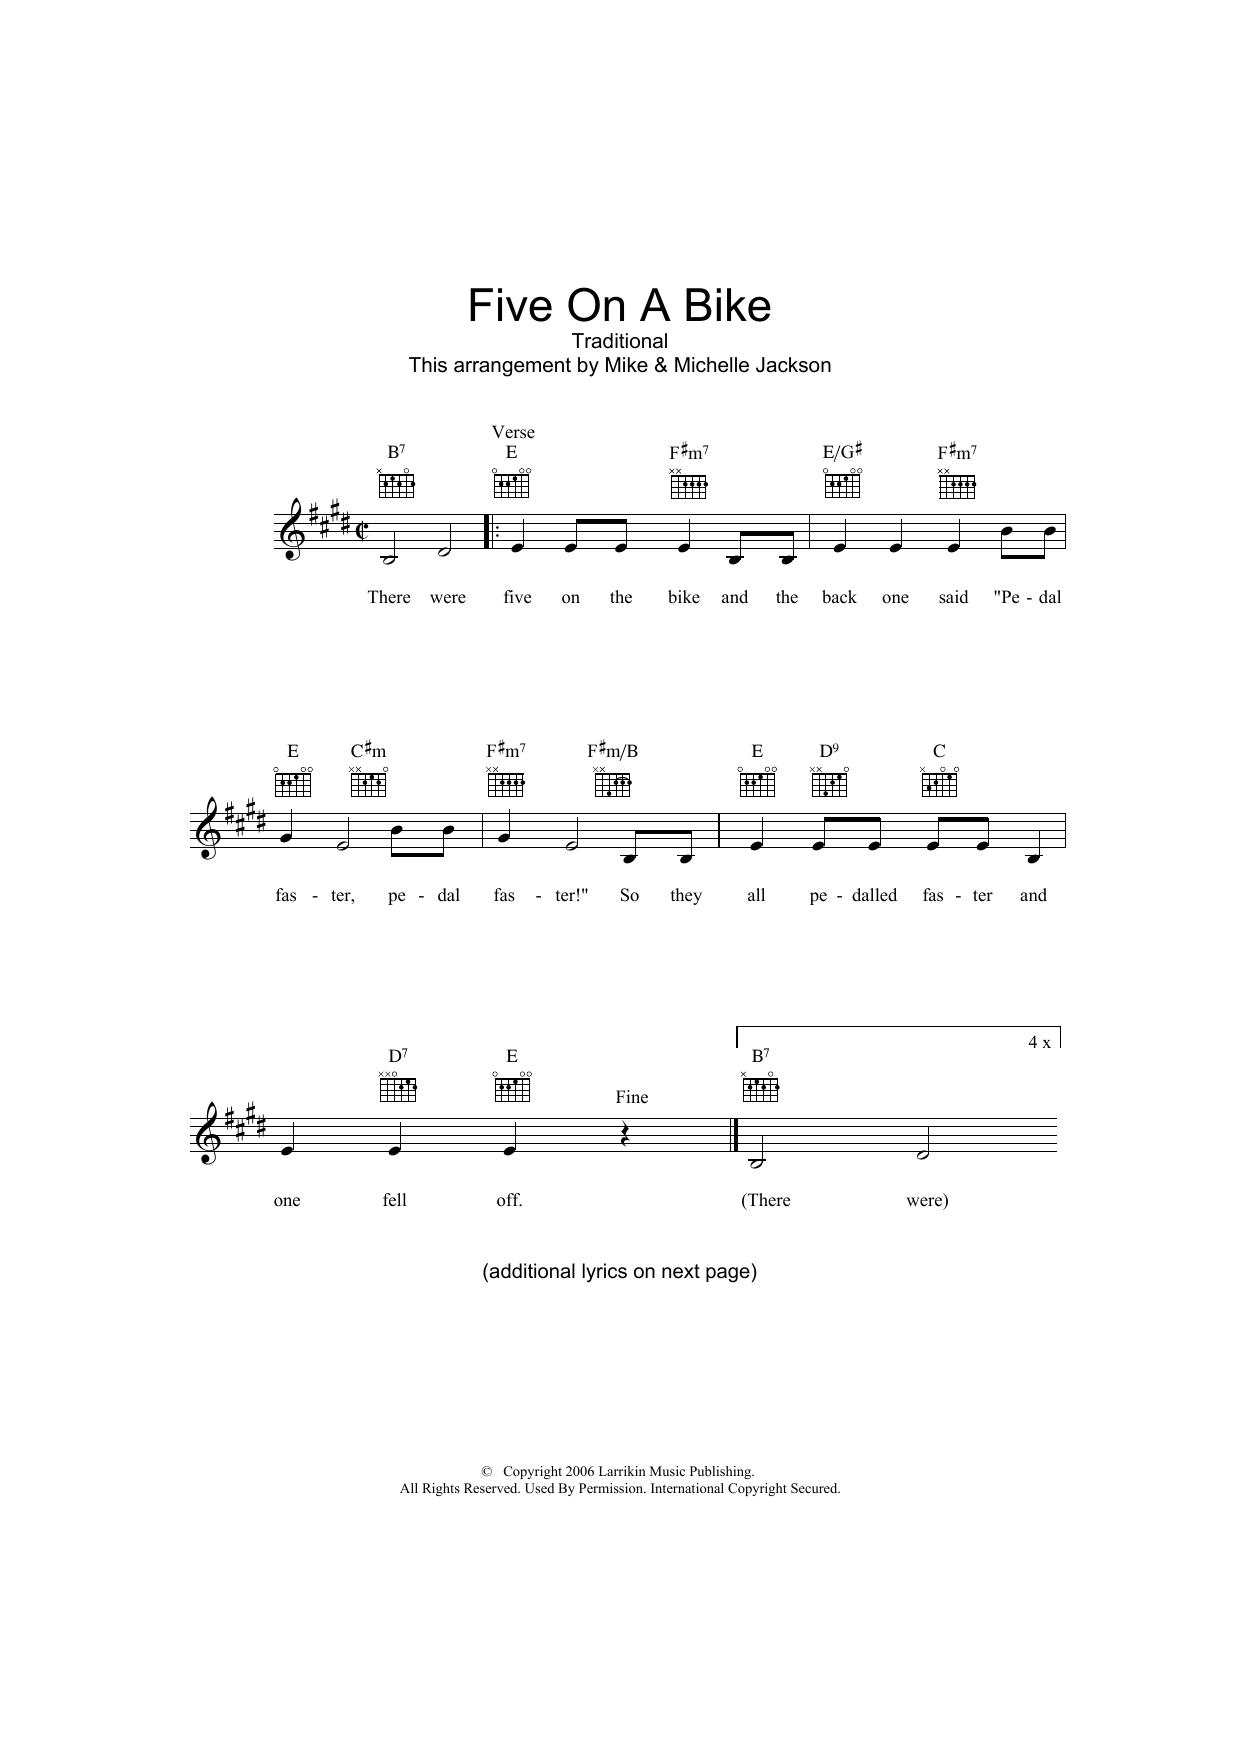 Traditional - Five On A Bike